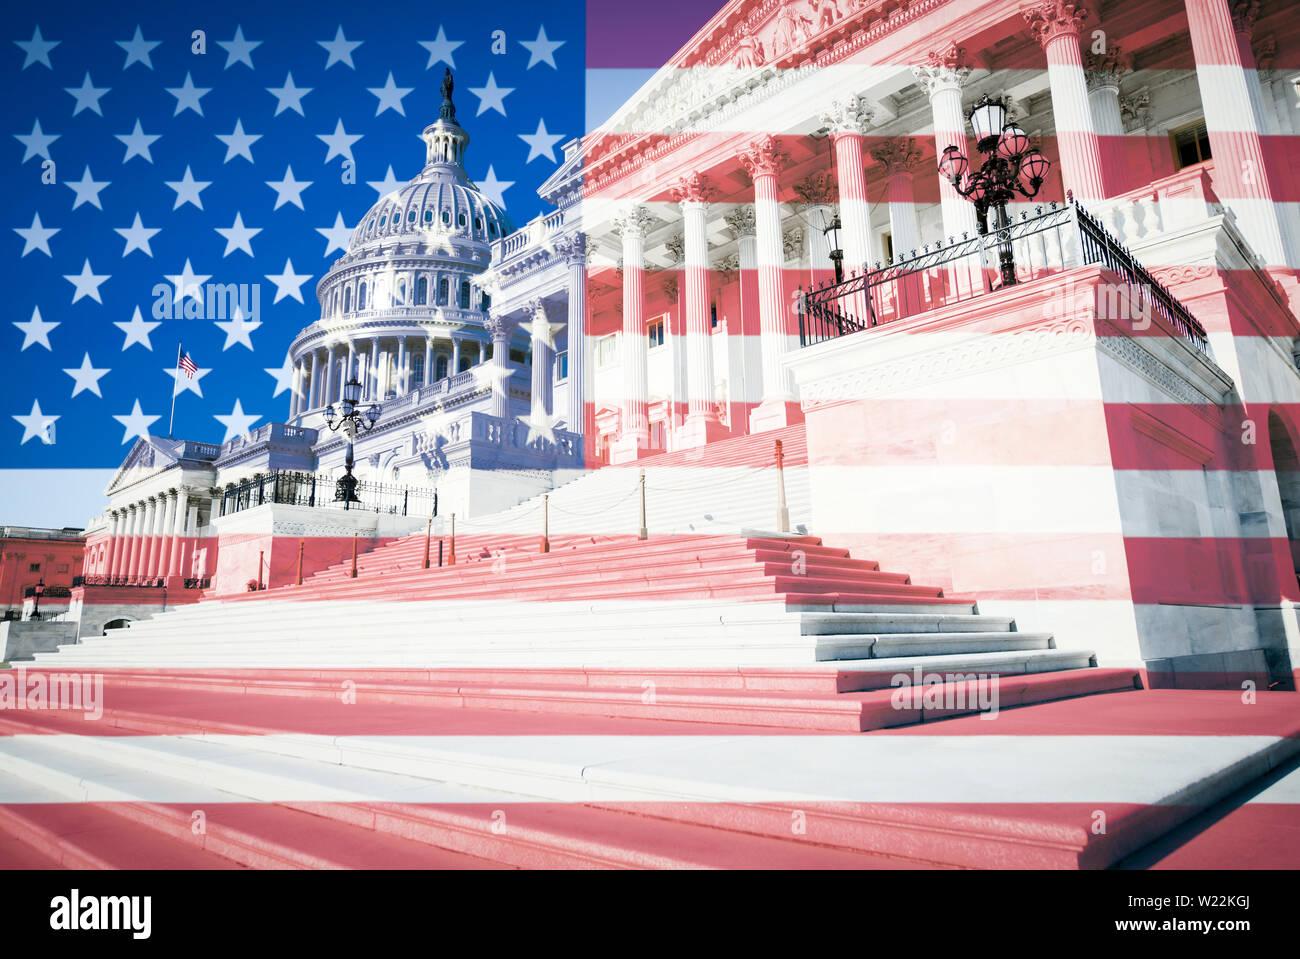 Flag Overlay Stock Photos & Flag Overlay Stock Images - Alamy